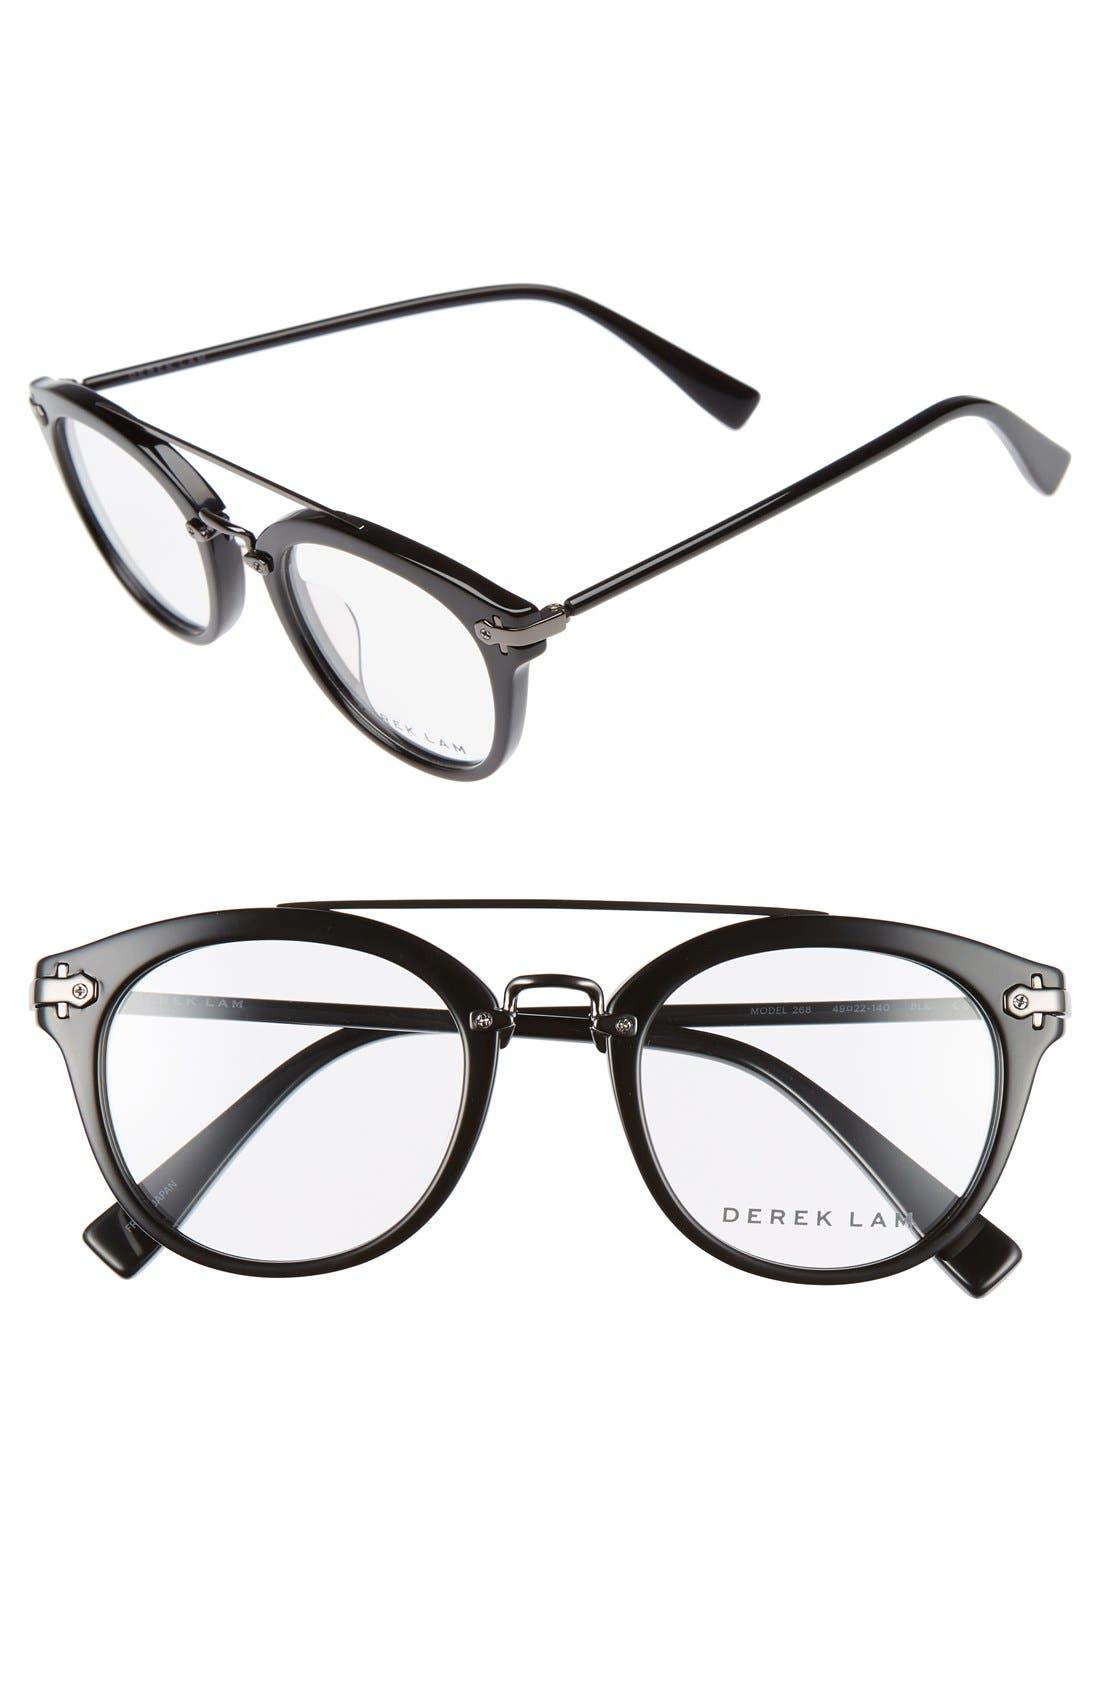 49mm Aviator Sunglasses,                             Main thumbnail 1, color,                             BLACK